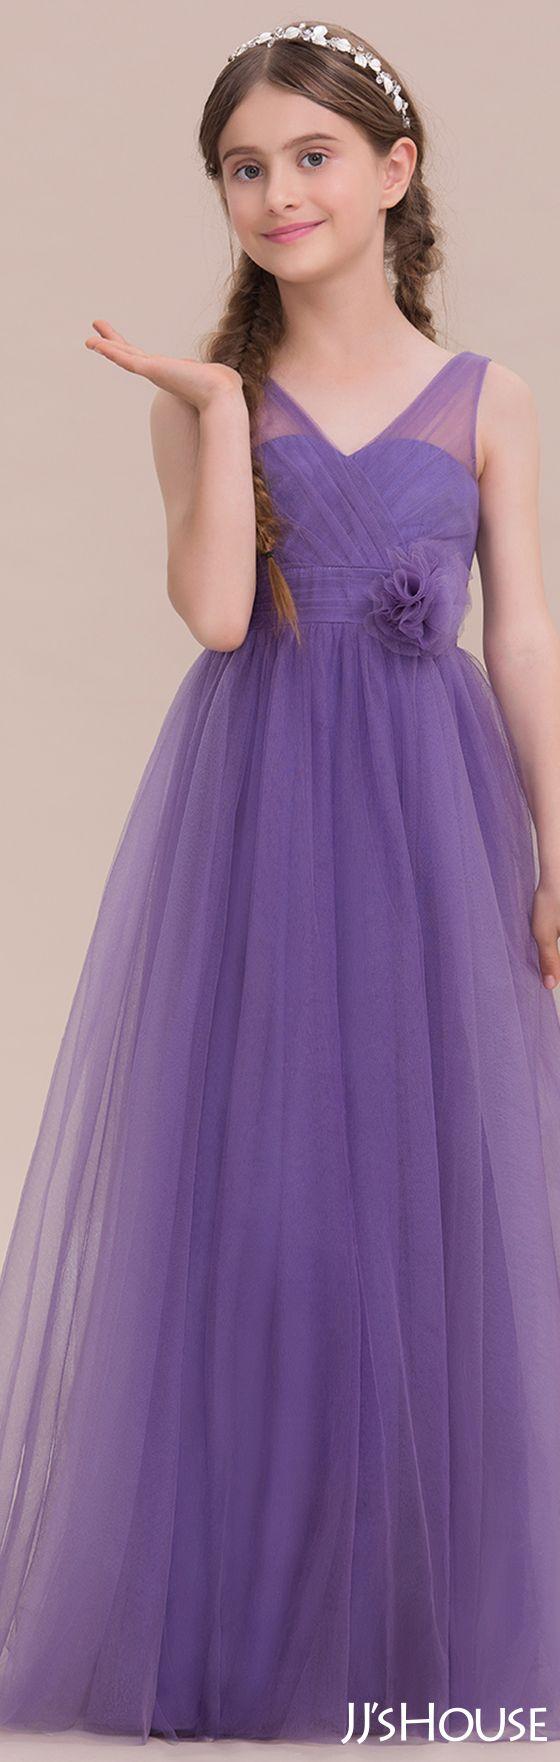 356 best vestidos para niñas images on Pinterest   Flower girls ...